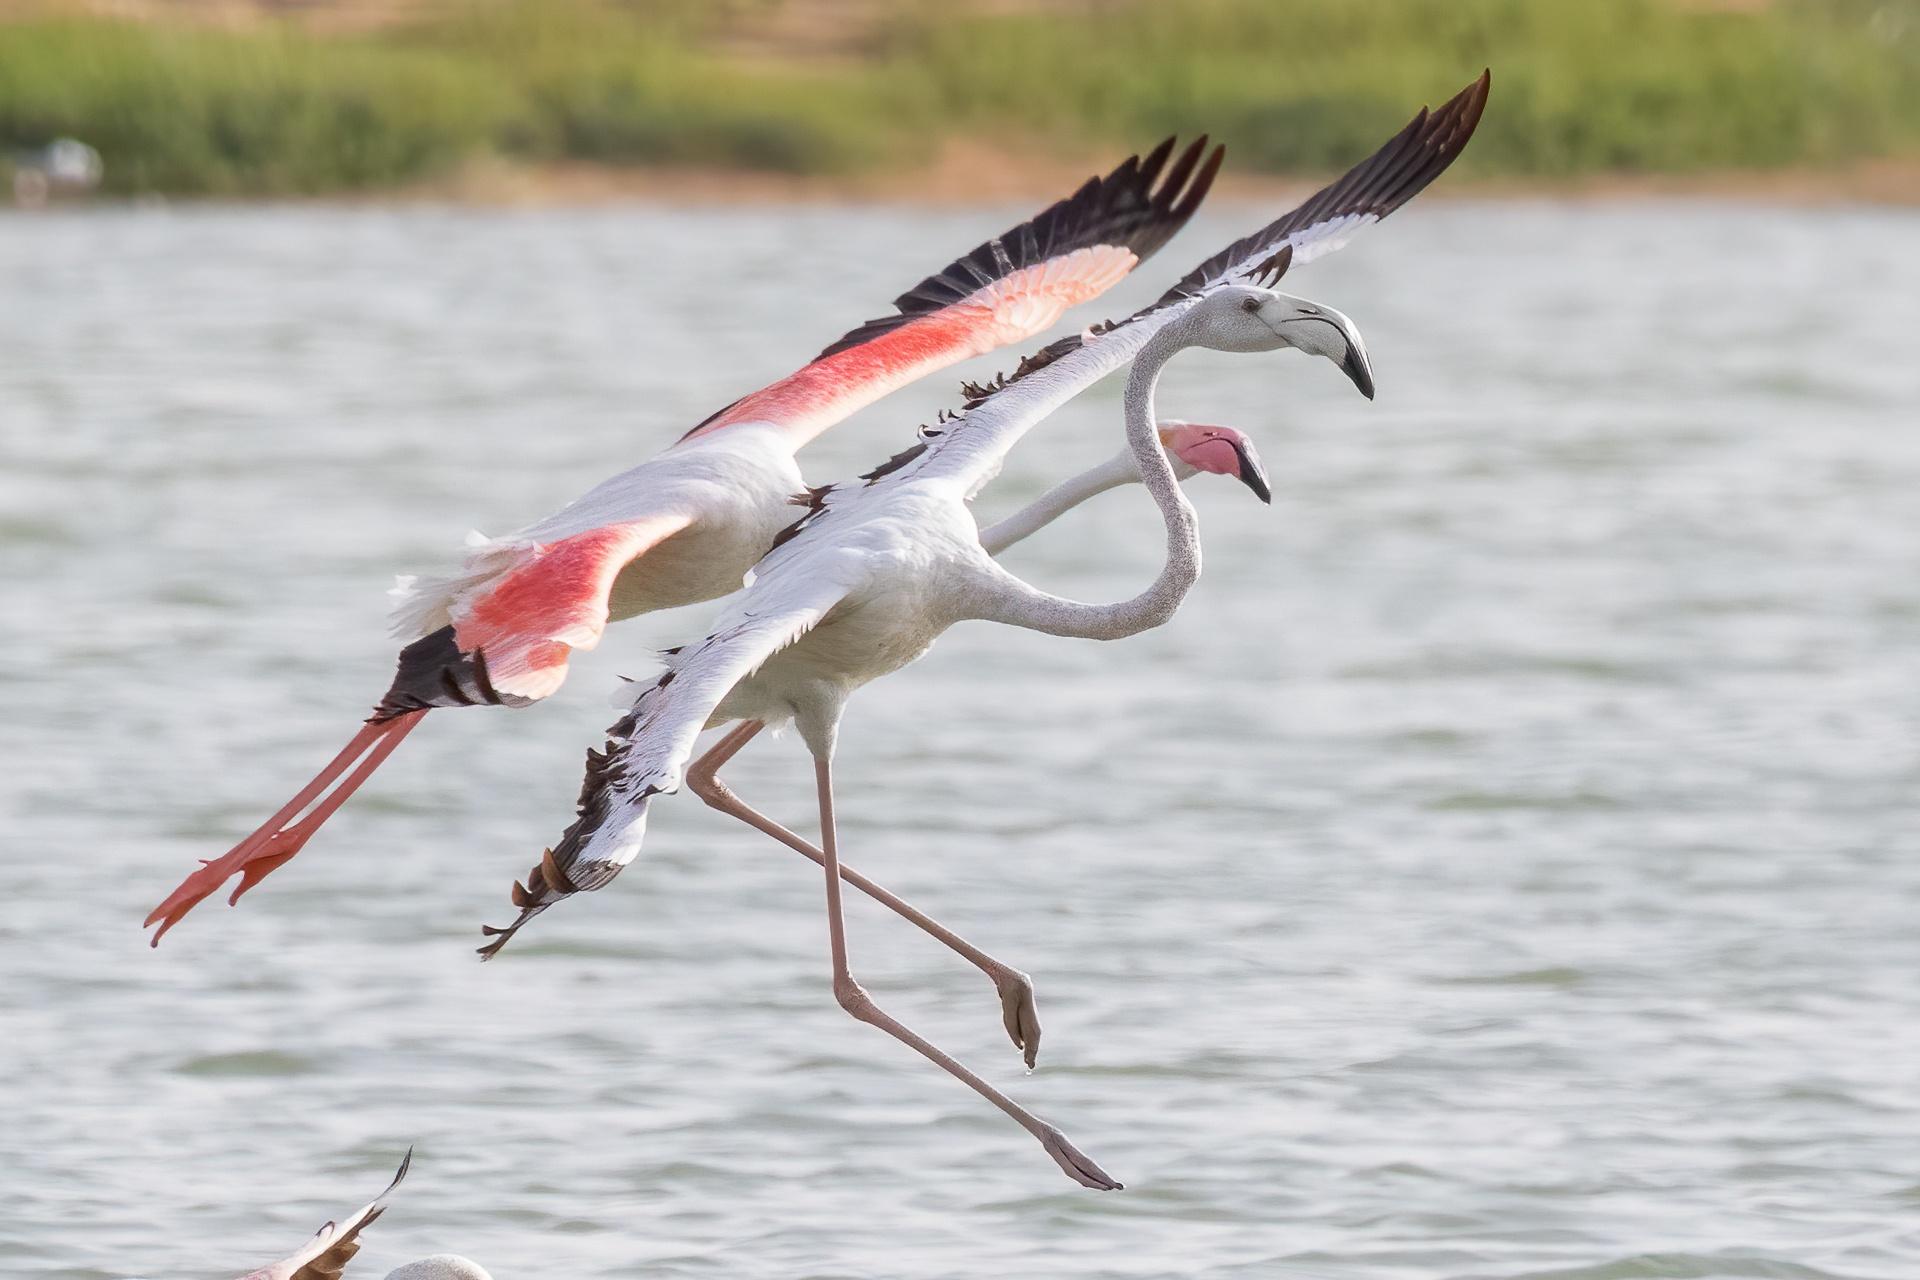 Flamingos on landing approach